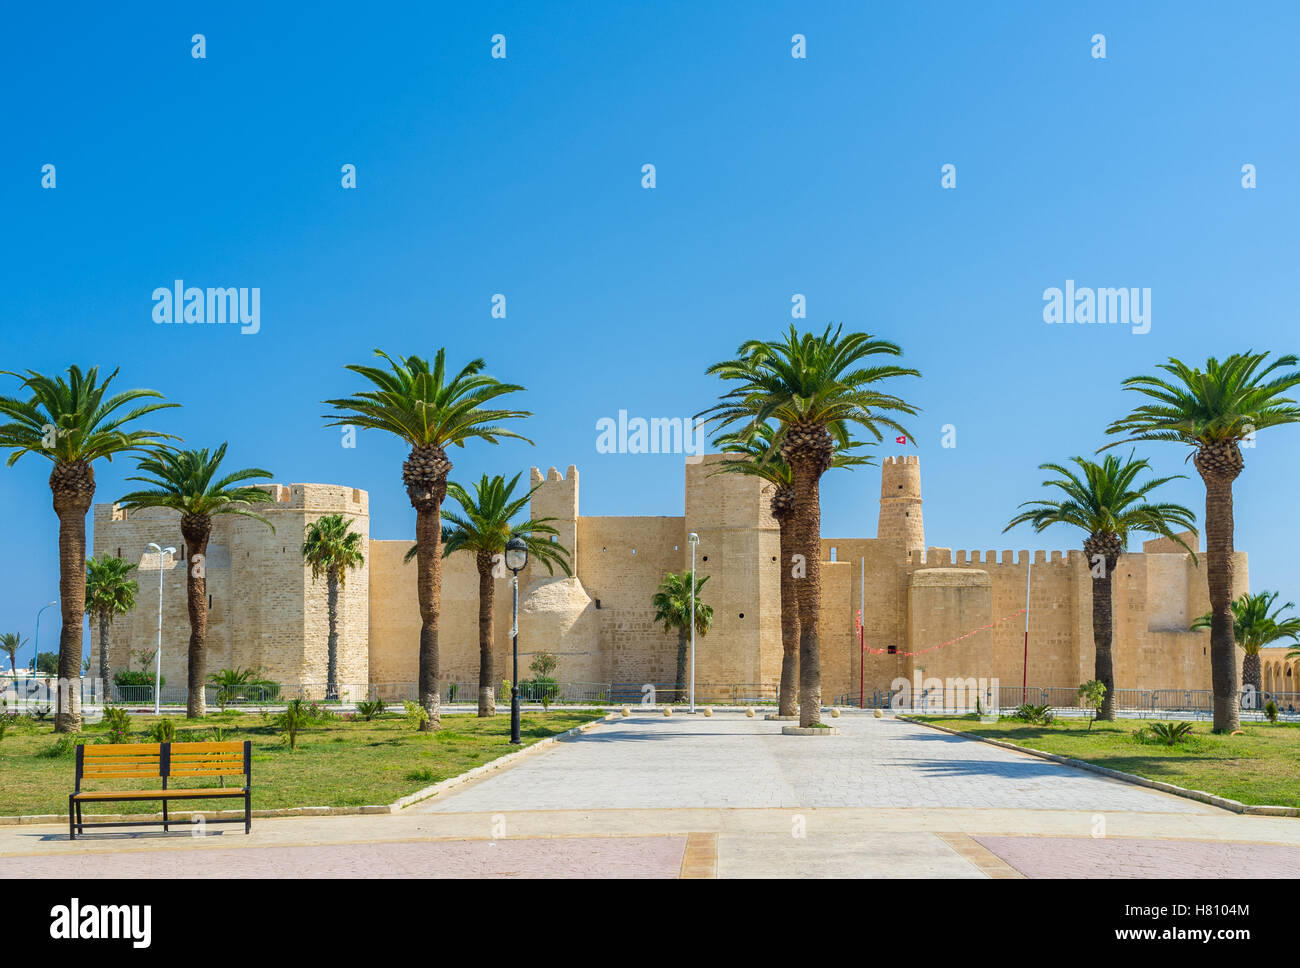 Ribat fortress is the visit card of Monastir, Tunisia. - Stock Image